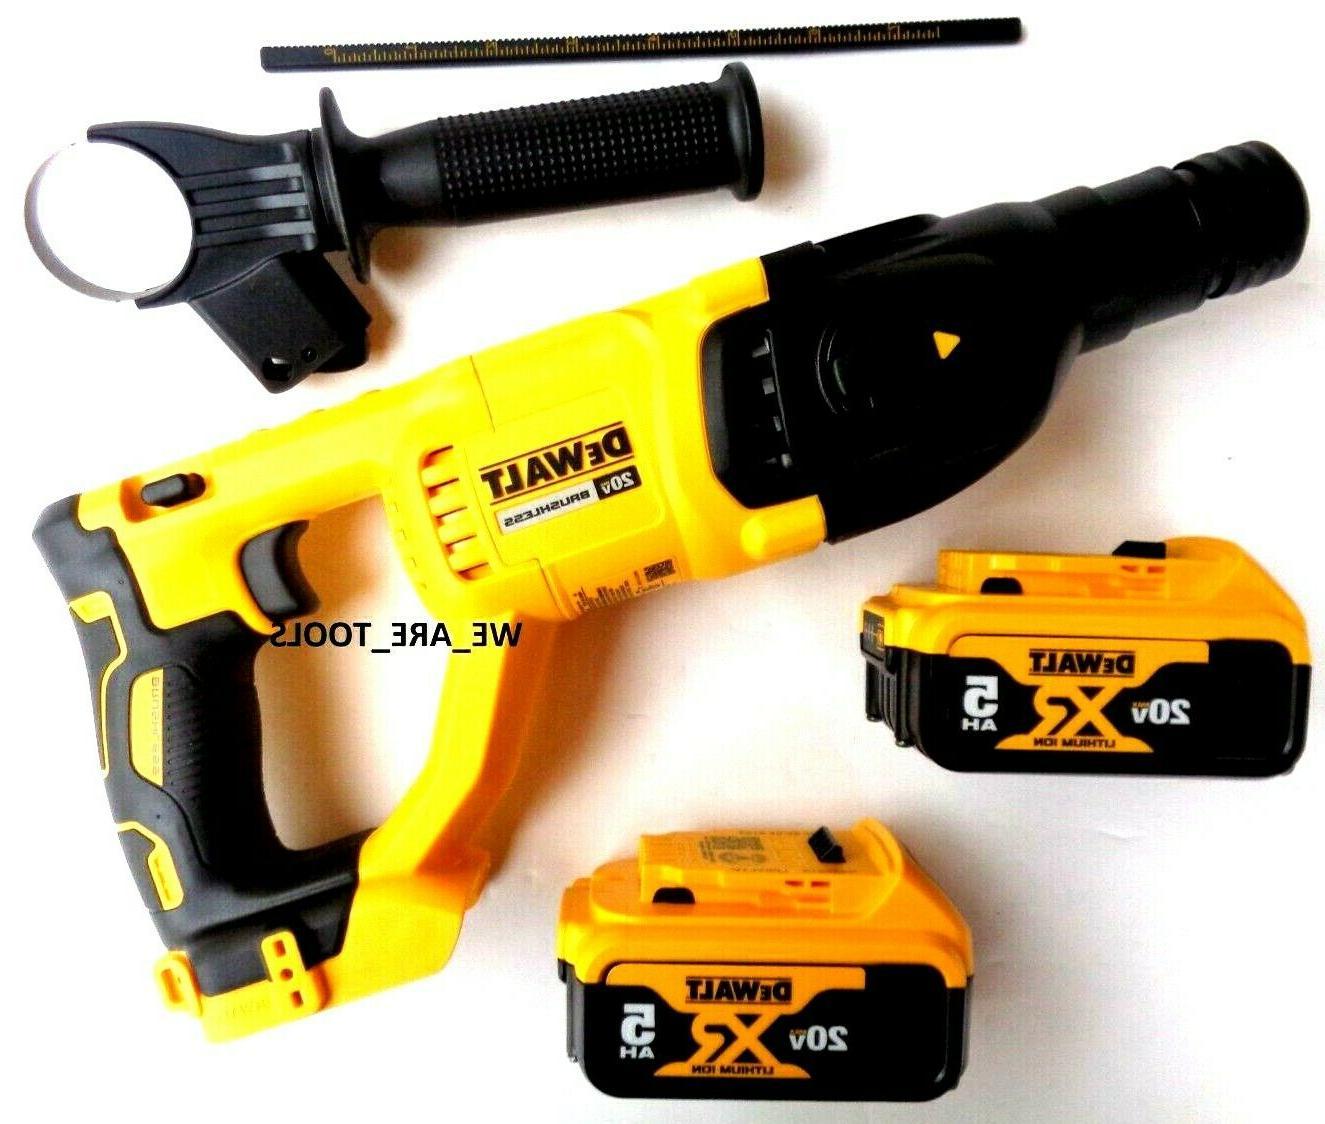 dch133 sds rotary hammer drill